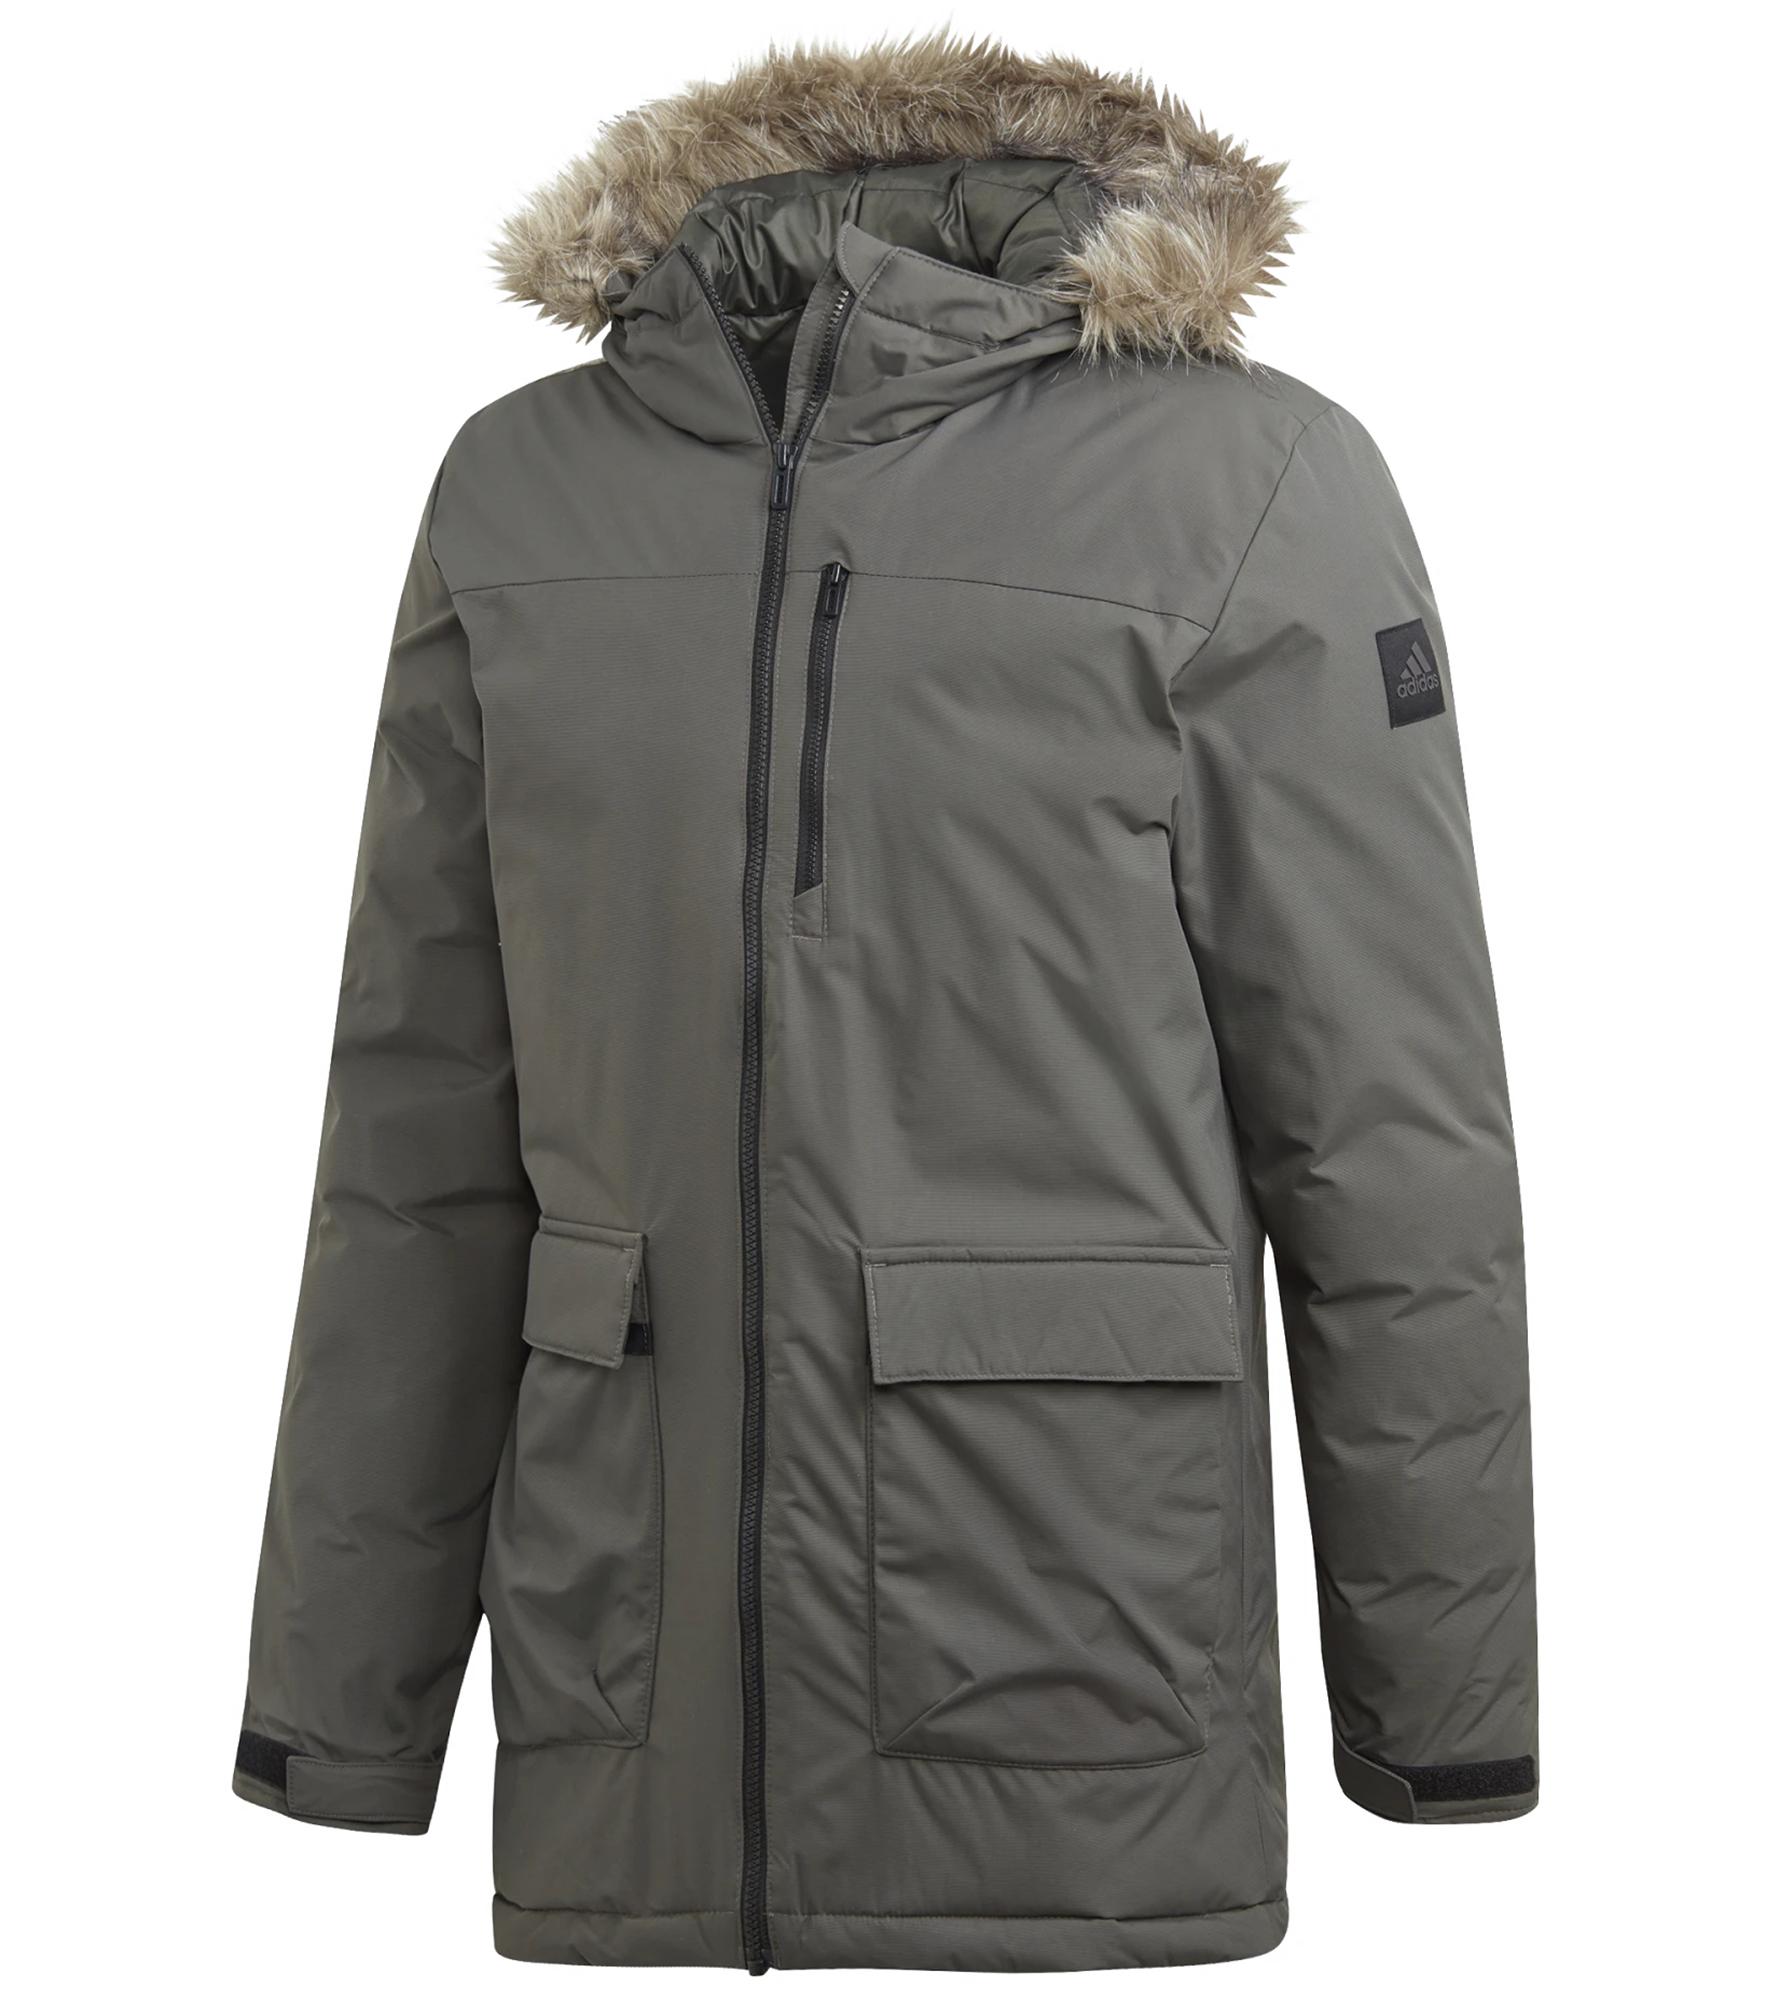 Adidas Куртка утепленная мужская XPLORIC, размер 58